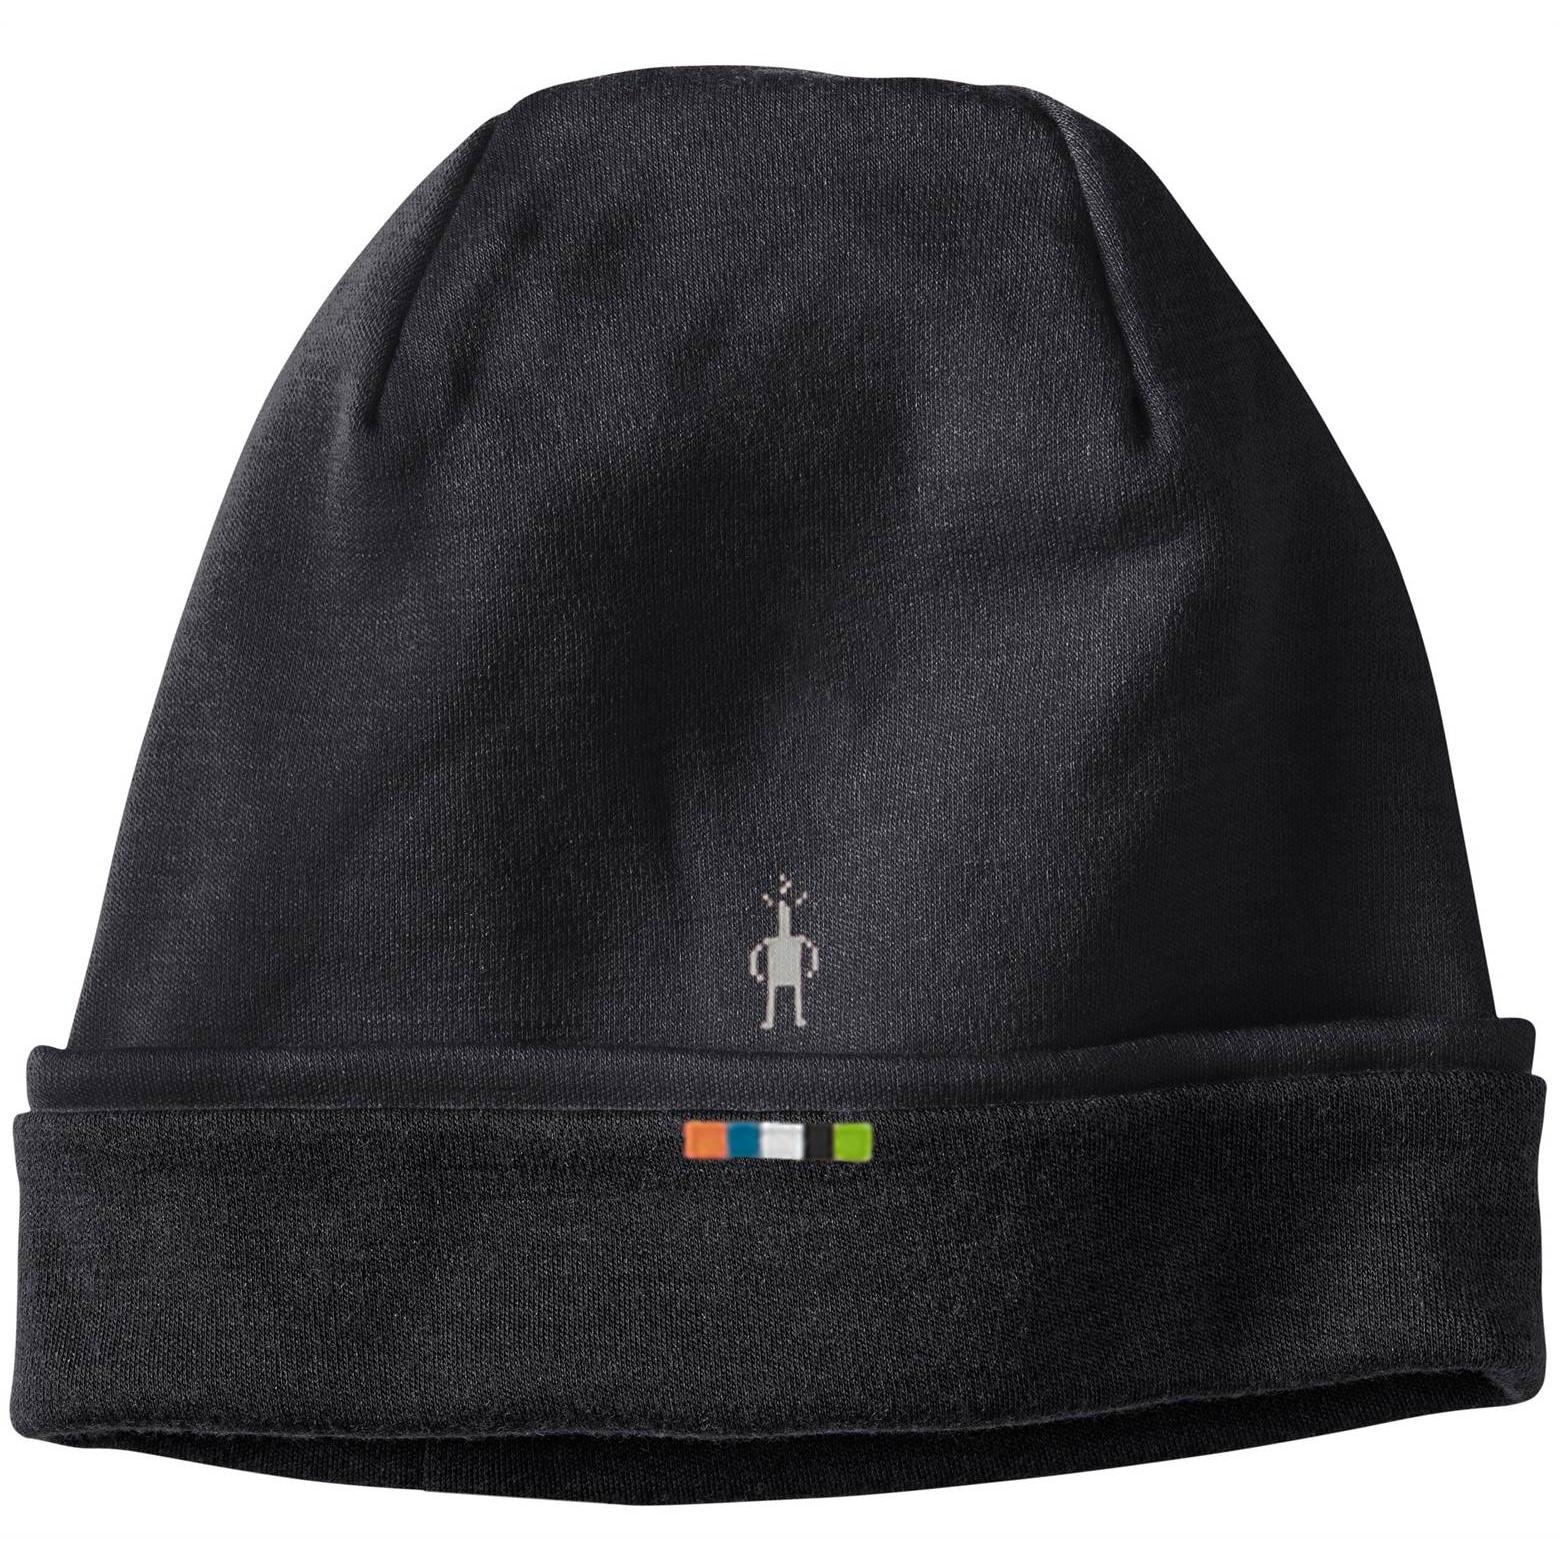 Winter Hats - Hats - Accessories - Men 789188e73895